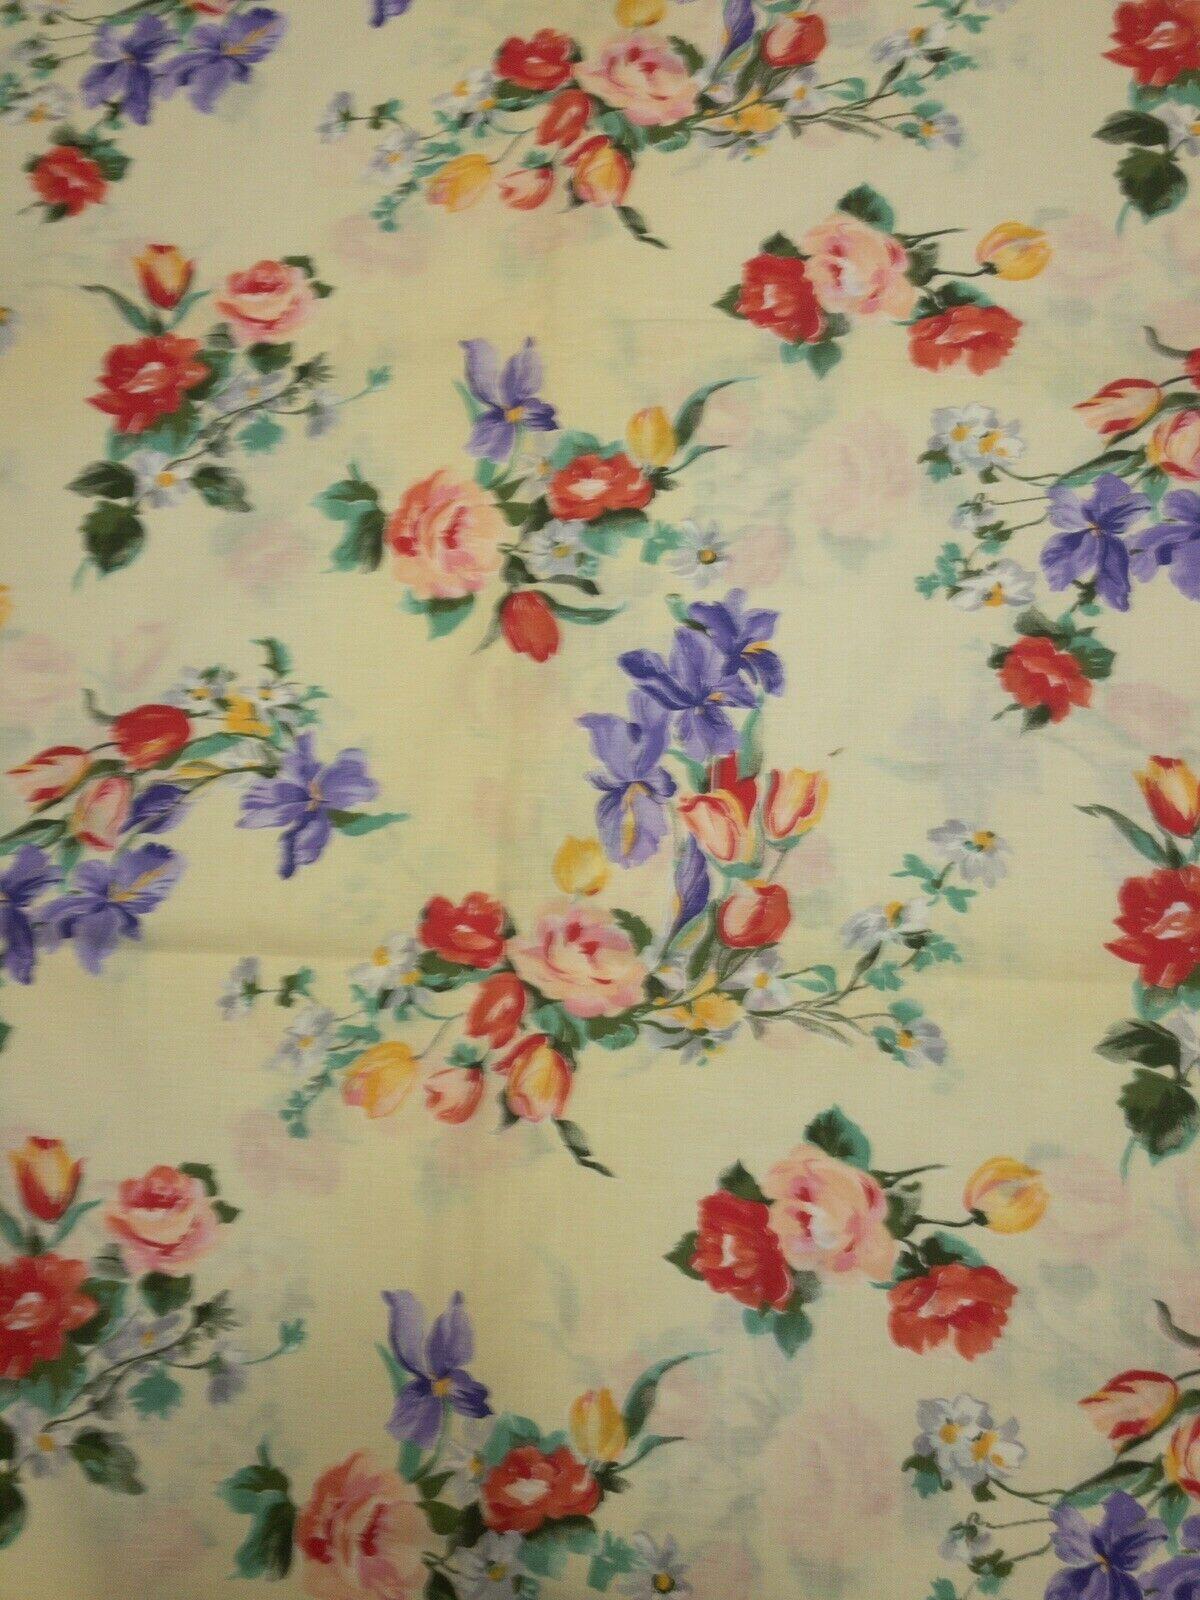 Spring Summer Floral Cotton Fabric Apparel Jbj Fabrics Oop 4 Yards In 2020 Summer Floral Floral Stripe Fabric